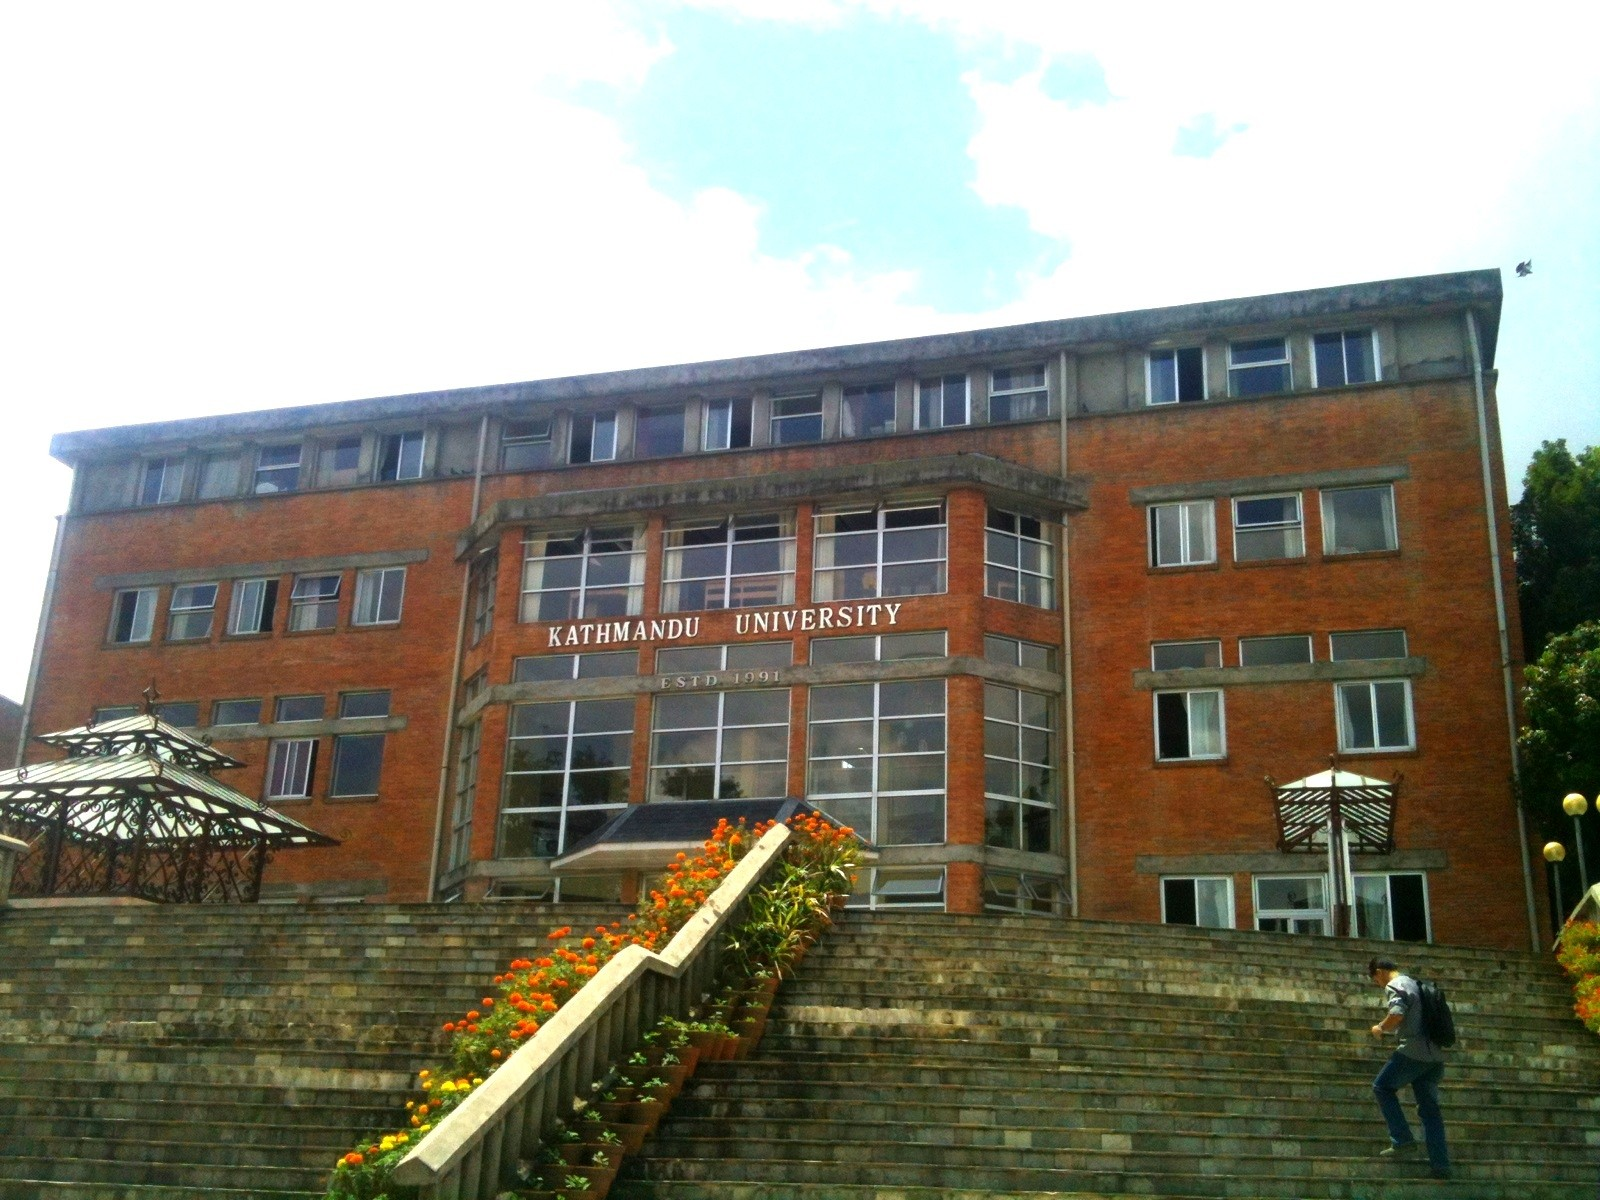 काठमाडाैं विश्वविद्यालयकाे ताला अझैं खुलेन